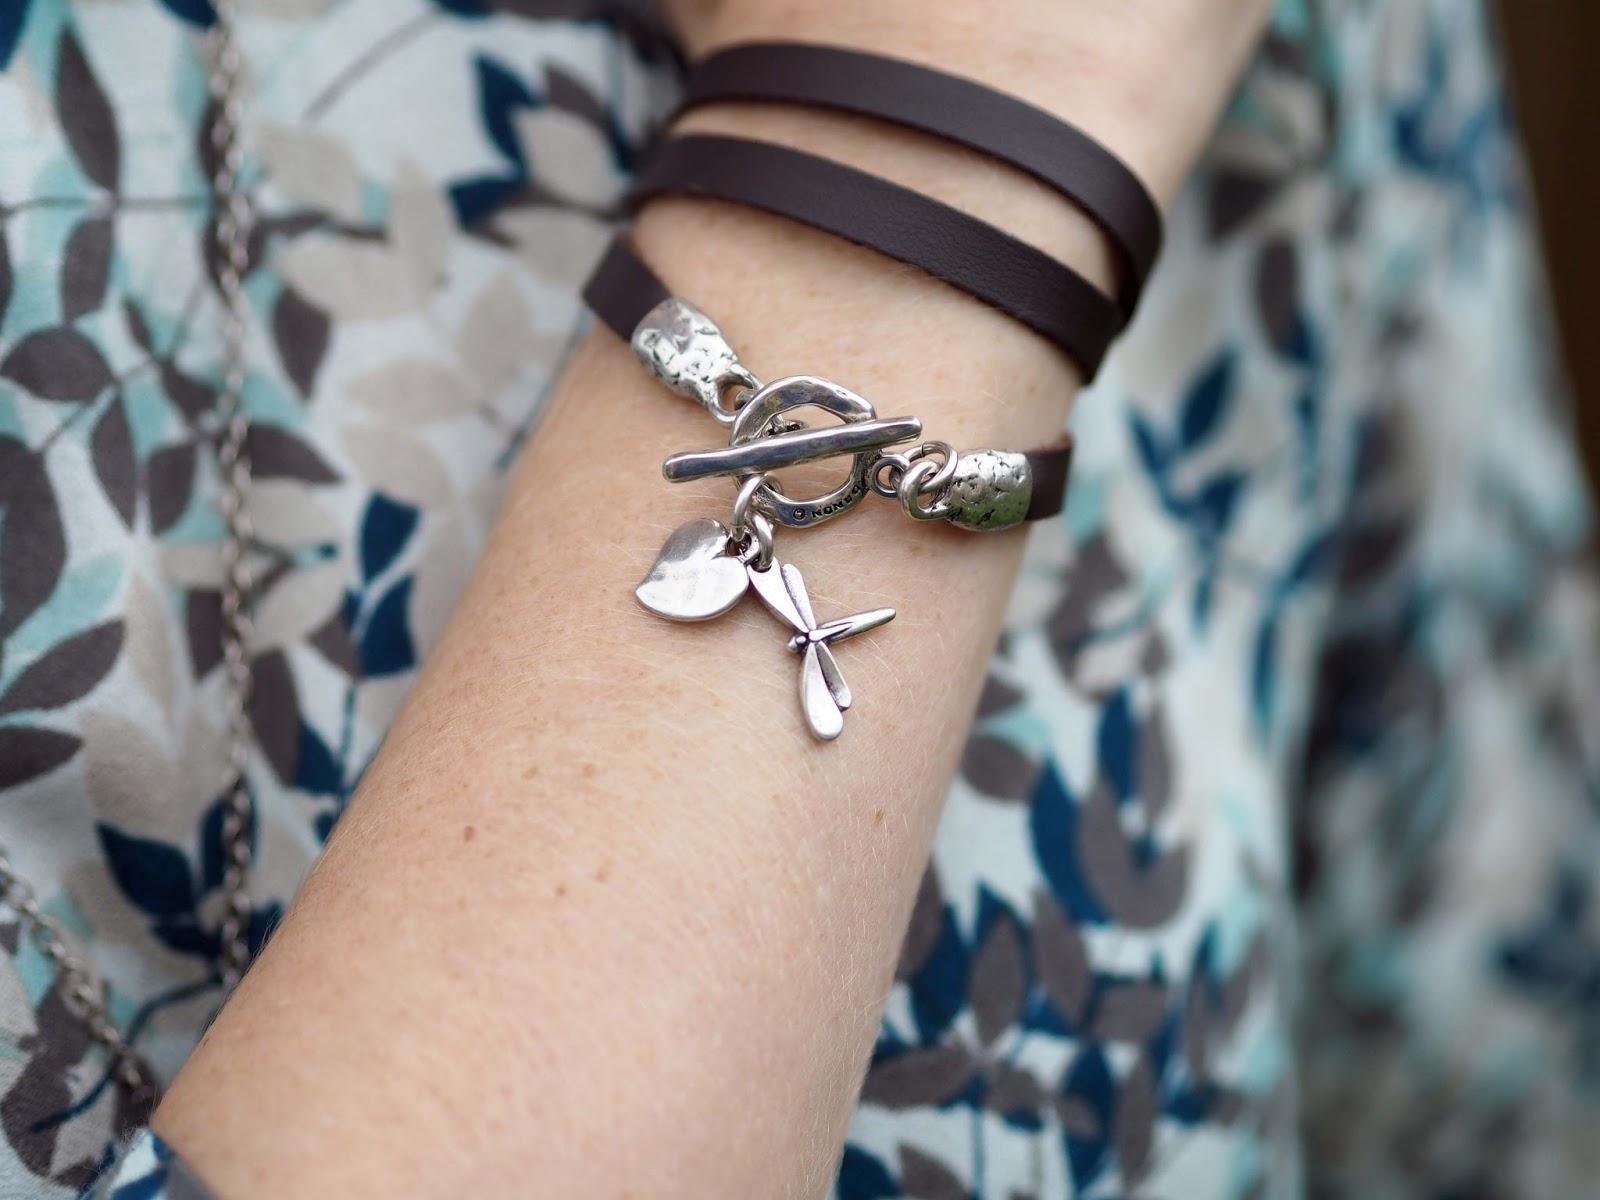 Danon dragonfly leather wrap bracelet from www.lizzyo.co.uk